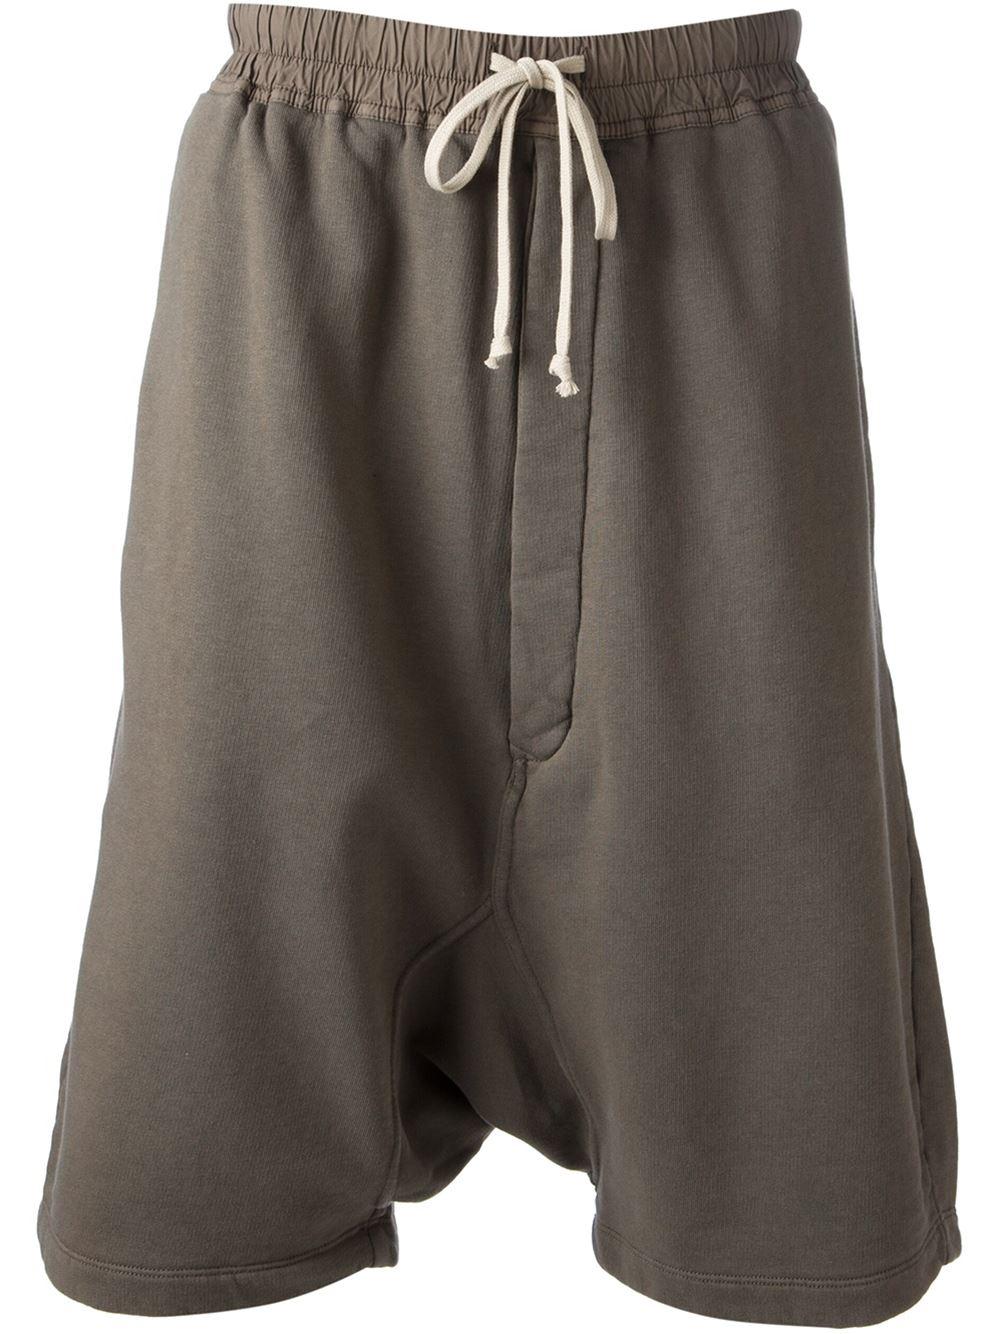 Crotch Shorts Schamlippen